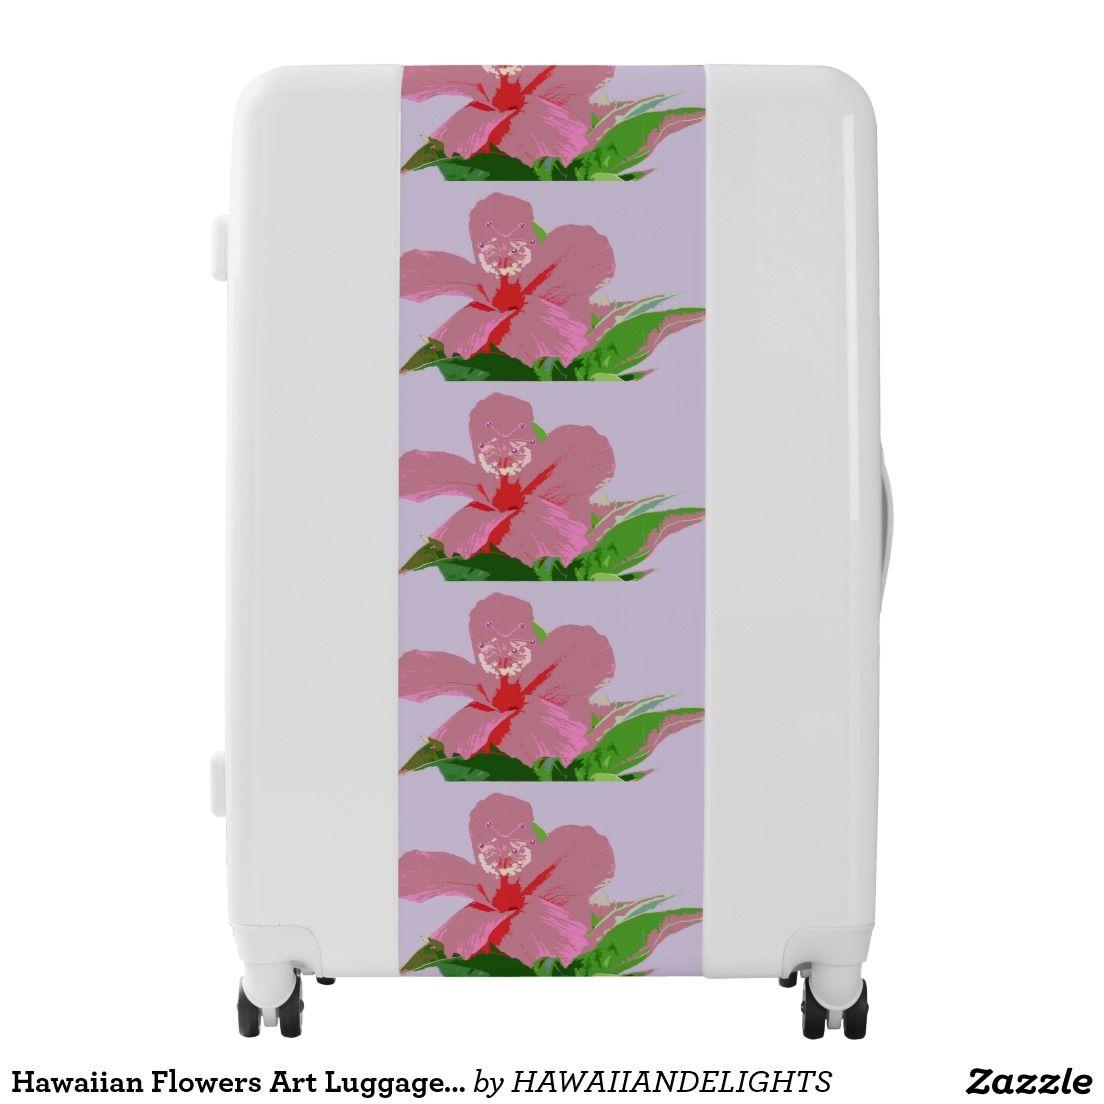 Hawaiian flowers art luggage suitcase pinterest suitcase and hawaiian flowers art luggage suitcase izmirmasajfo